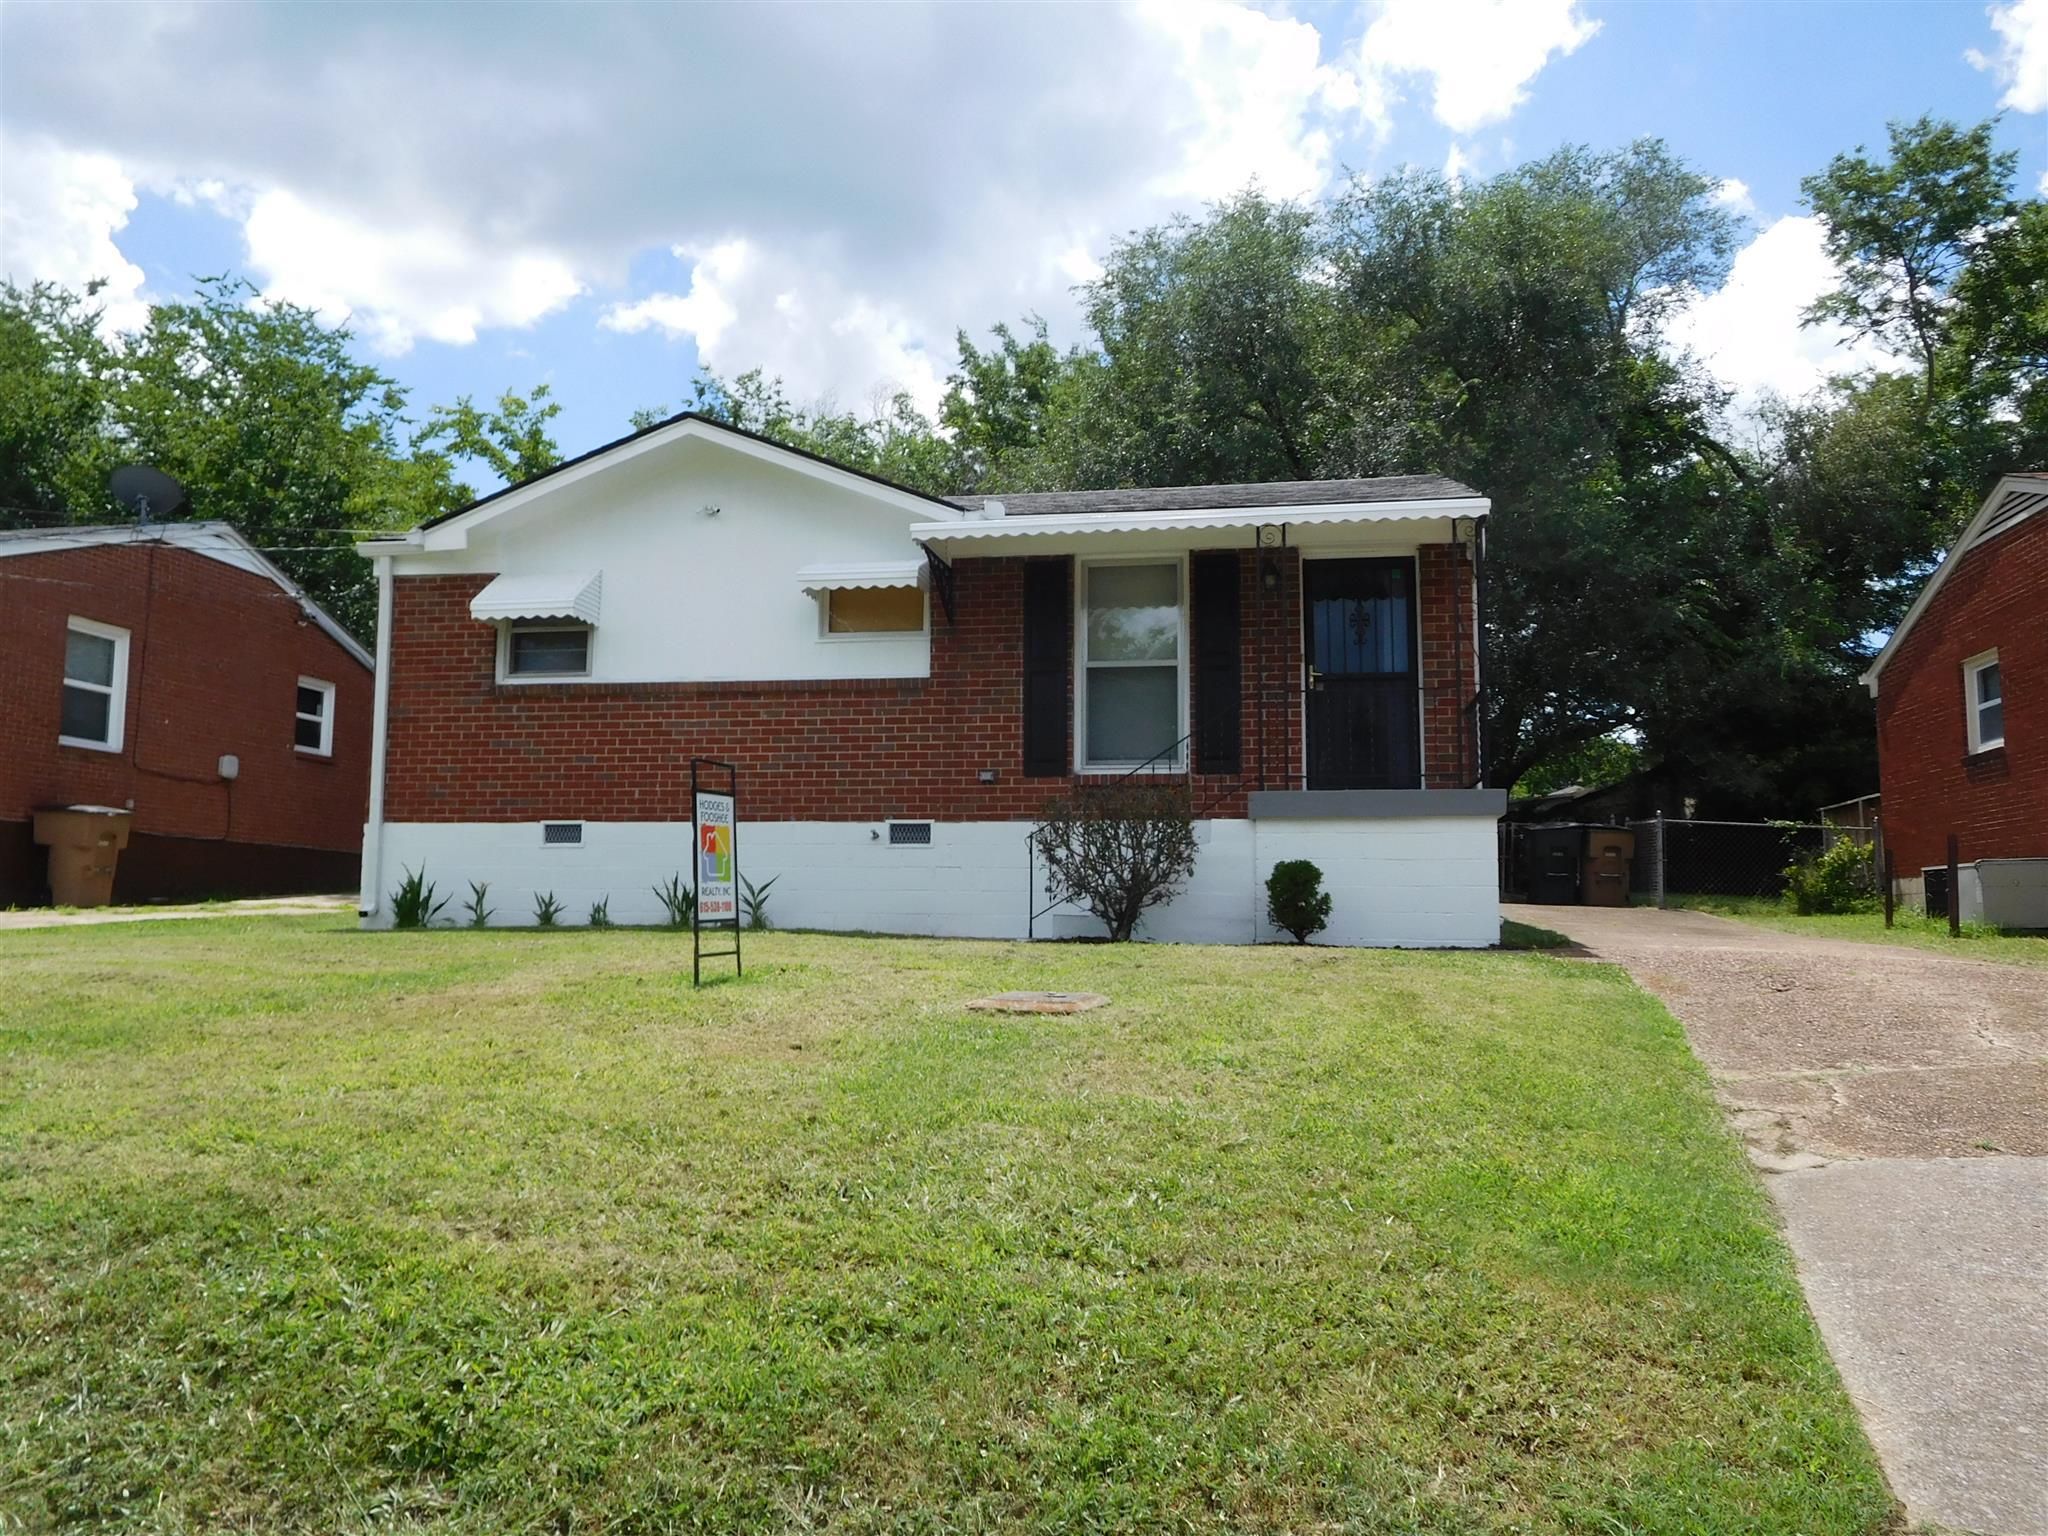 2229 11Th Ave N, Nashville, TN 37208 - Nashville, TN real estate listing